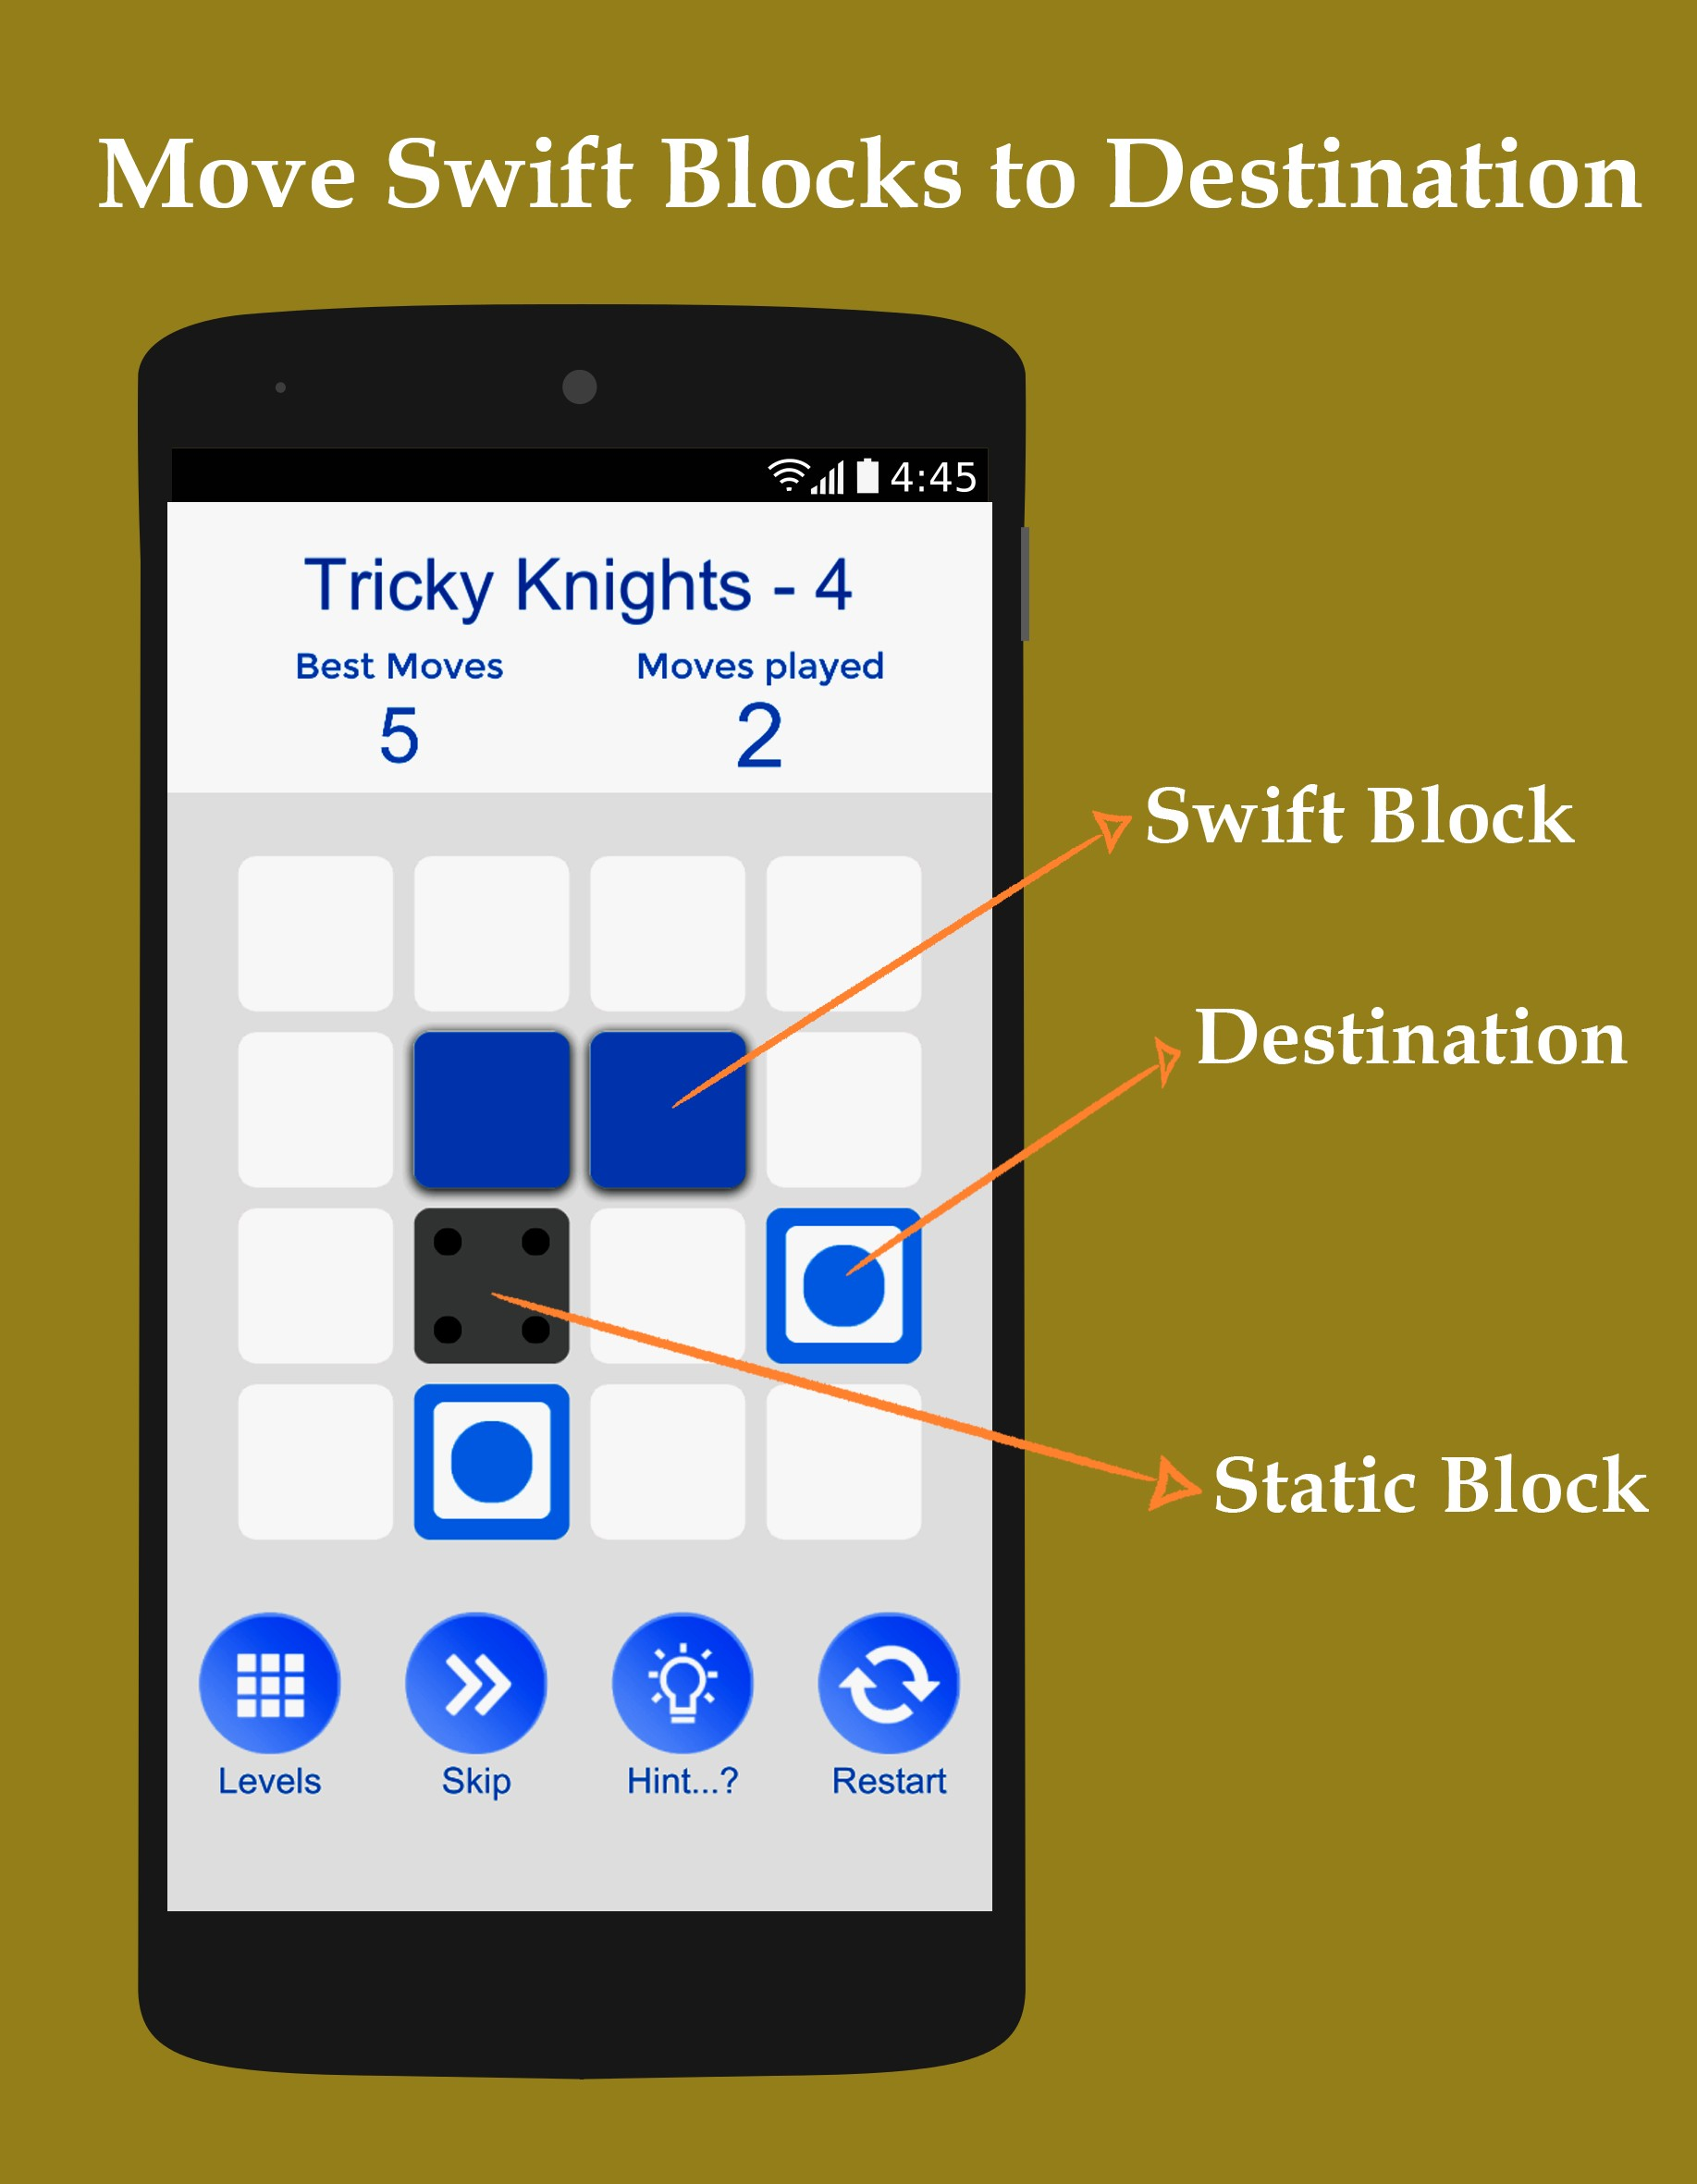 Swift Blocks